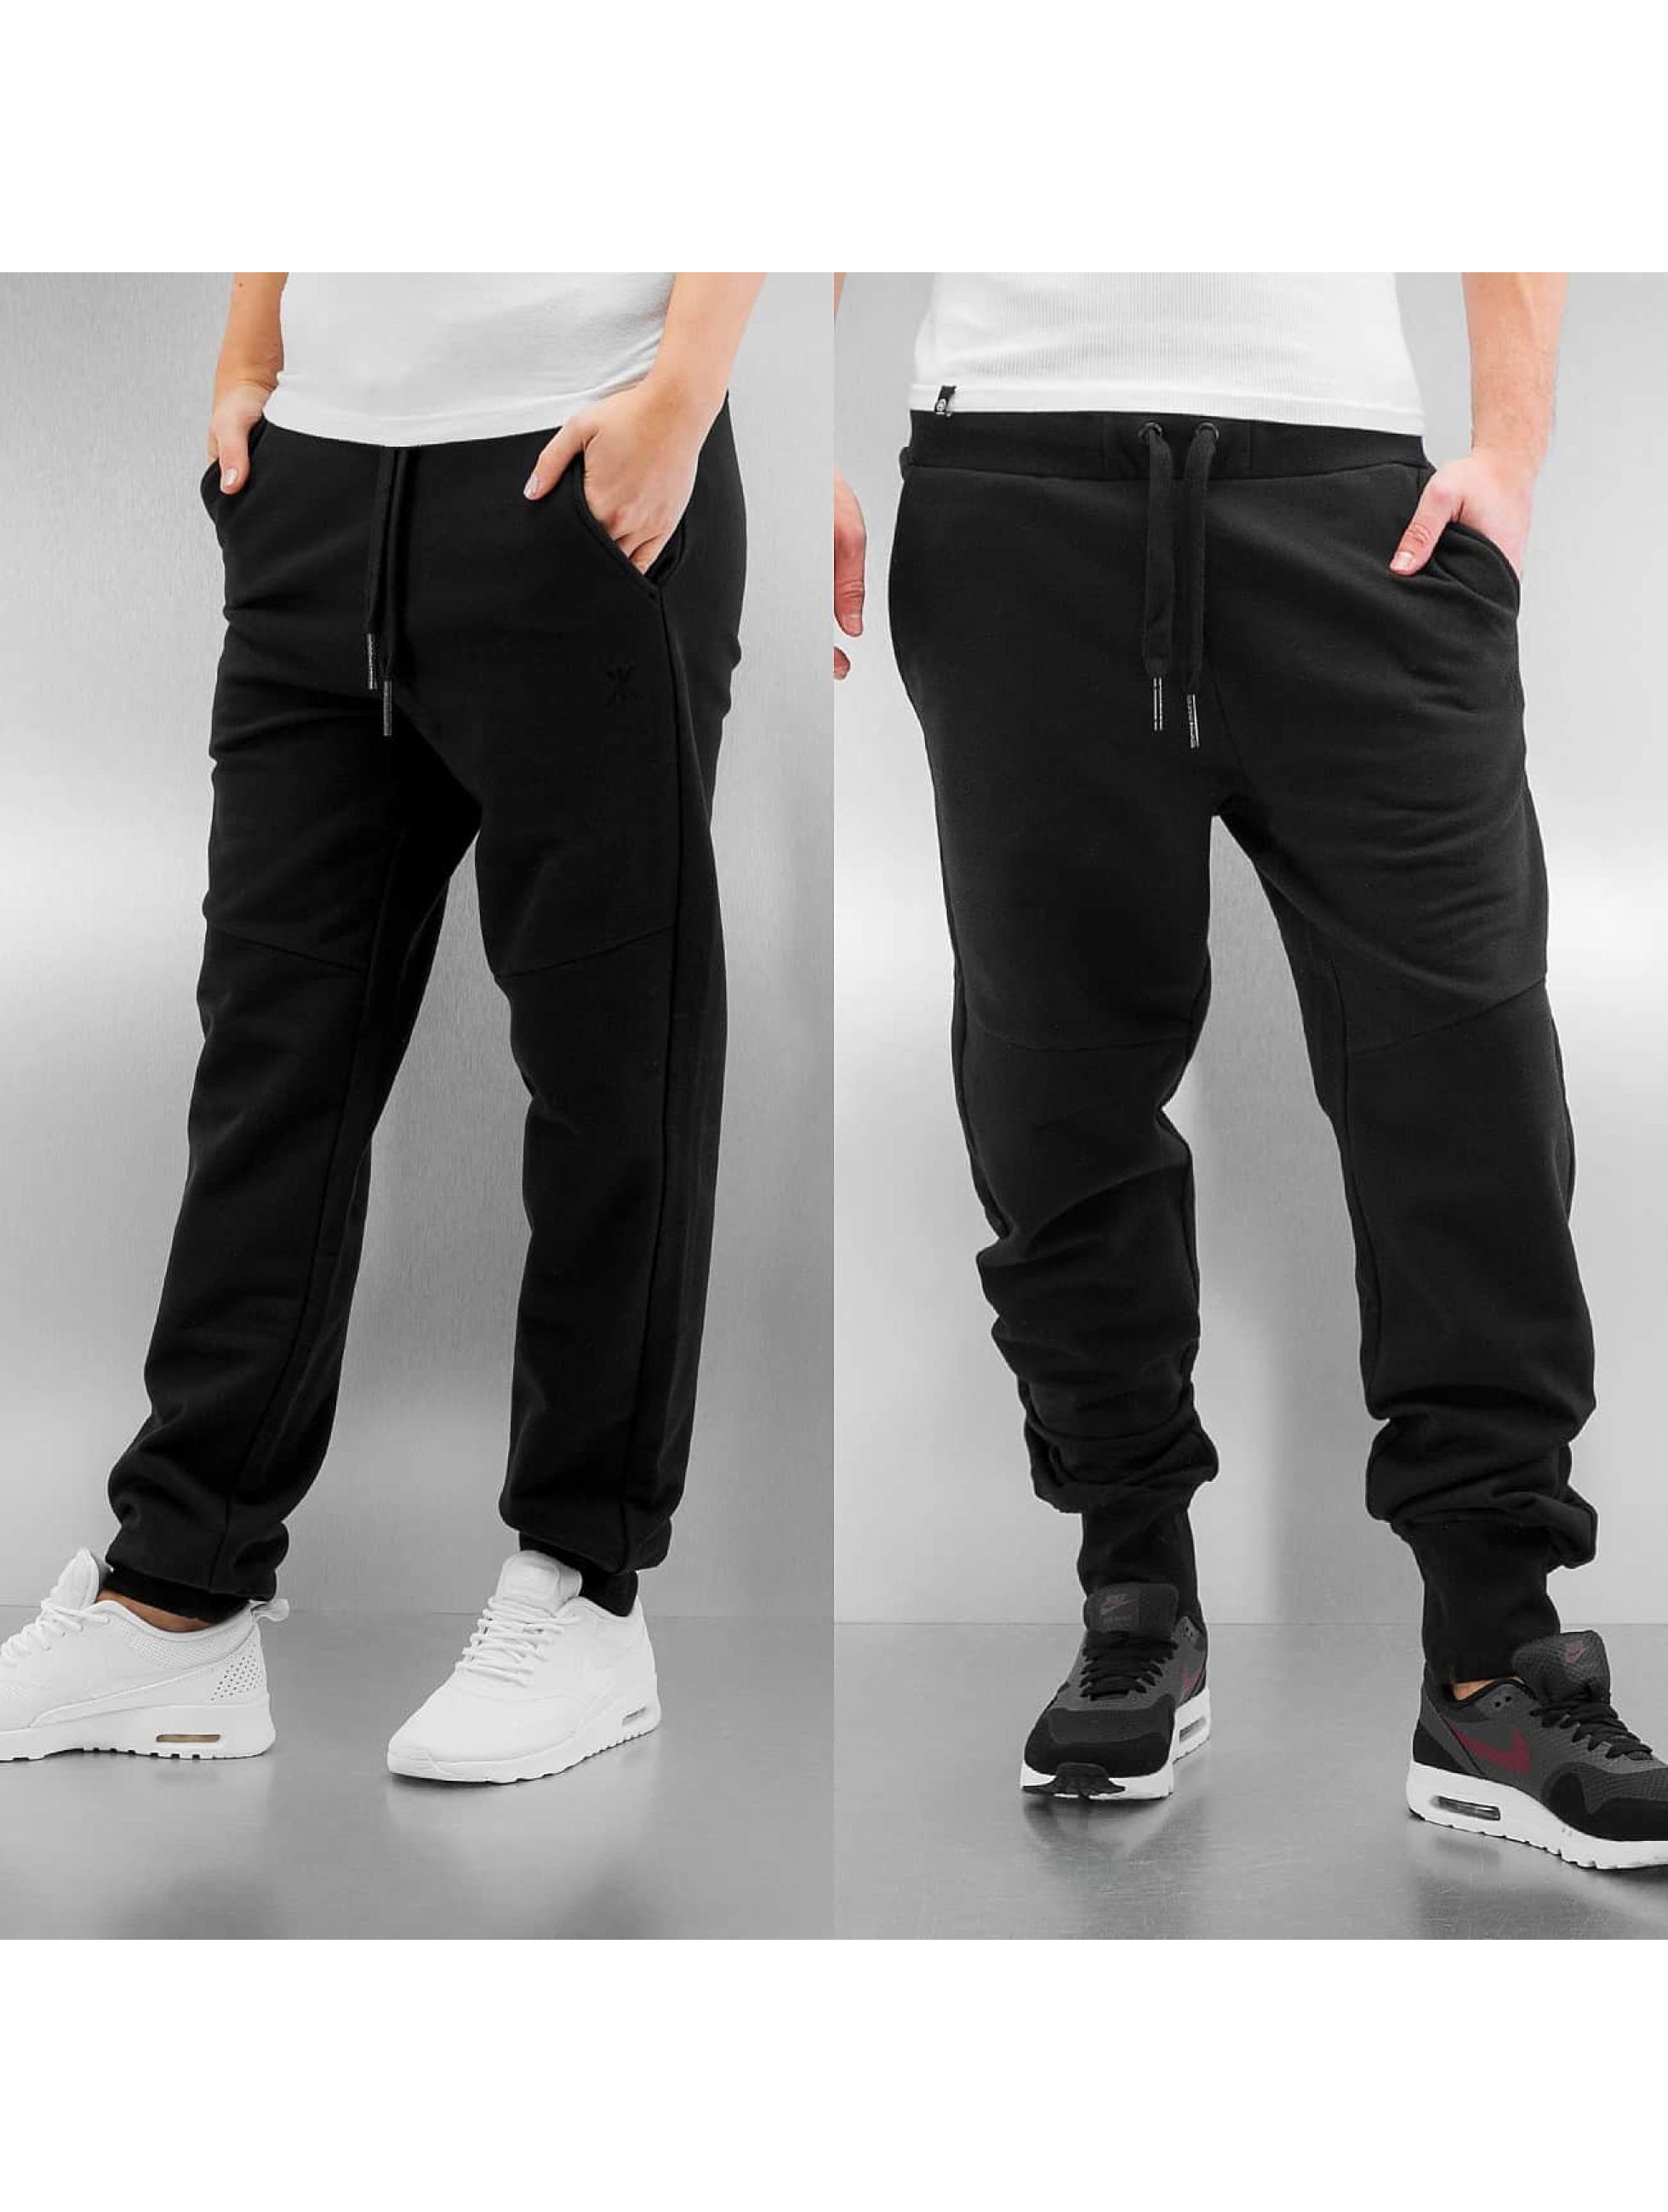 OnePiece Männer,Frauen Jogginghose Out Basic in schwarz